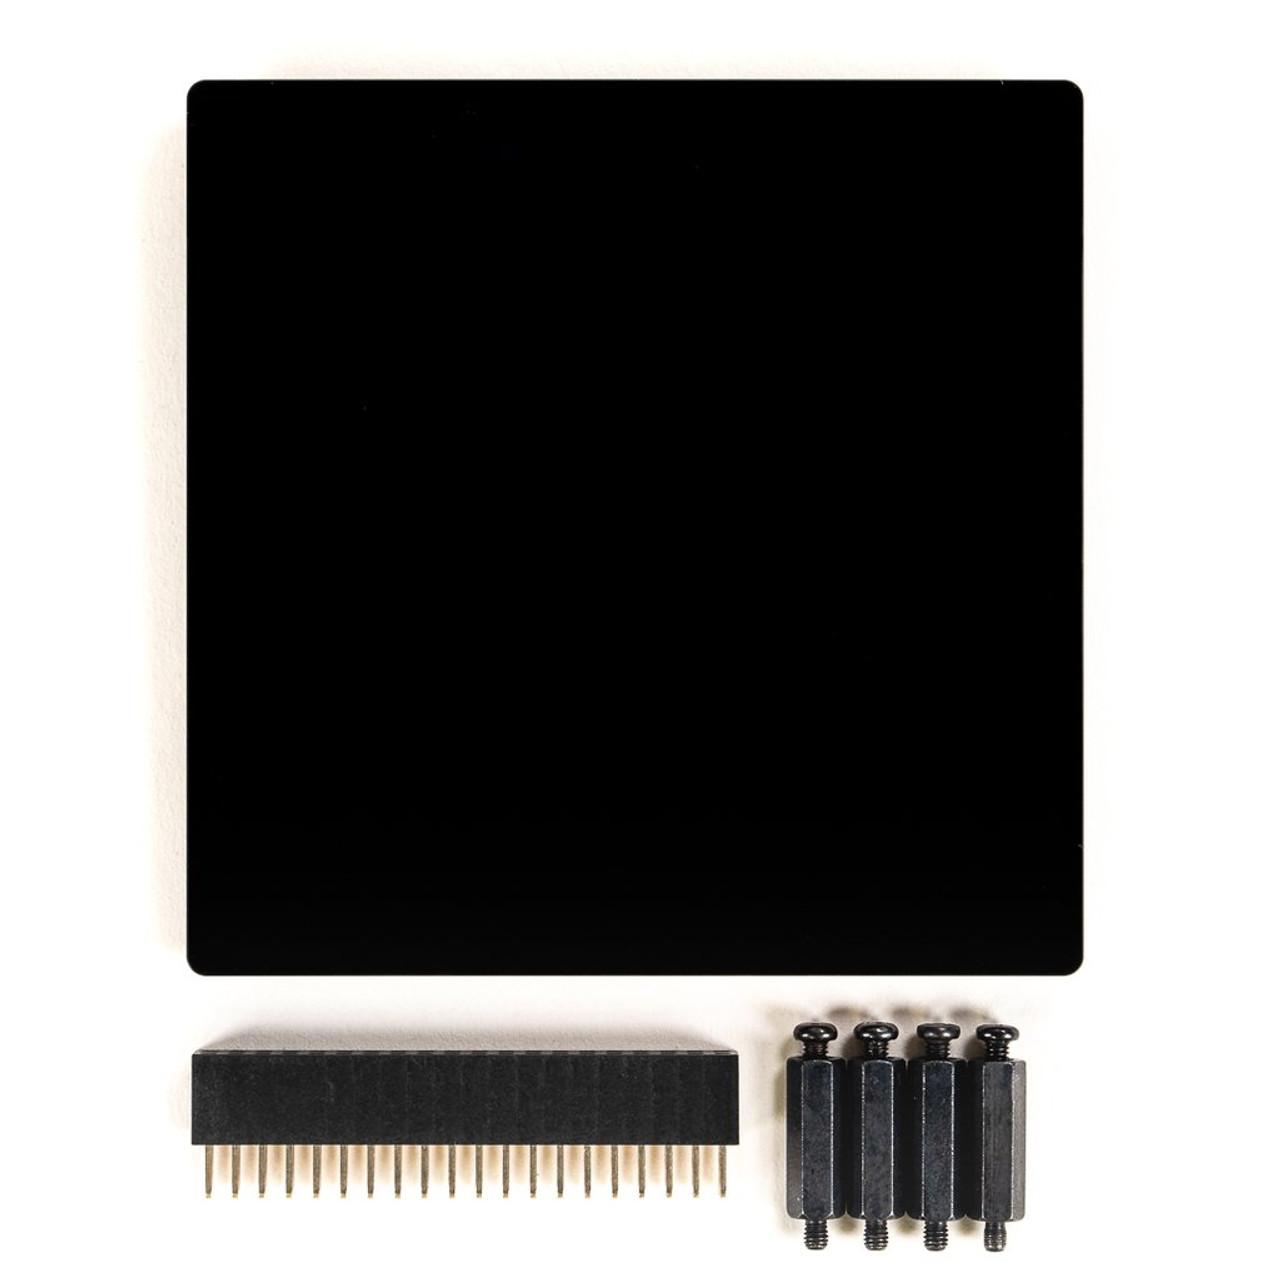 hyperpixel-square-shop-3_1024x1024__0292